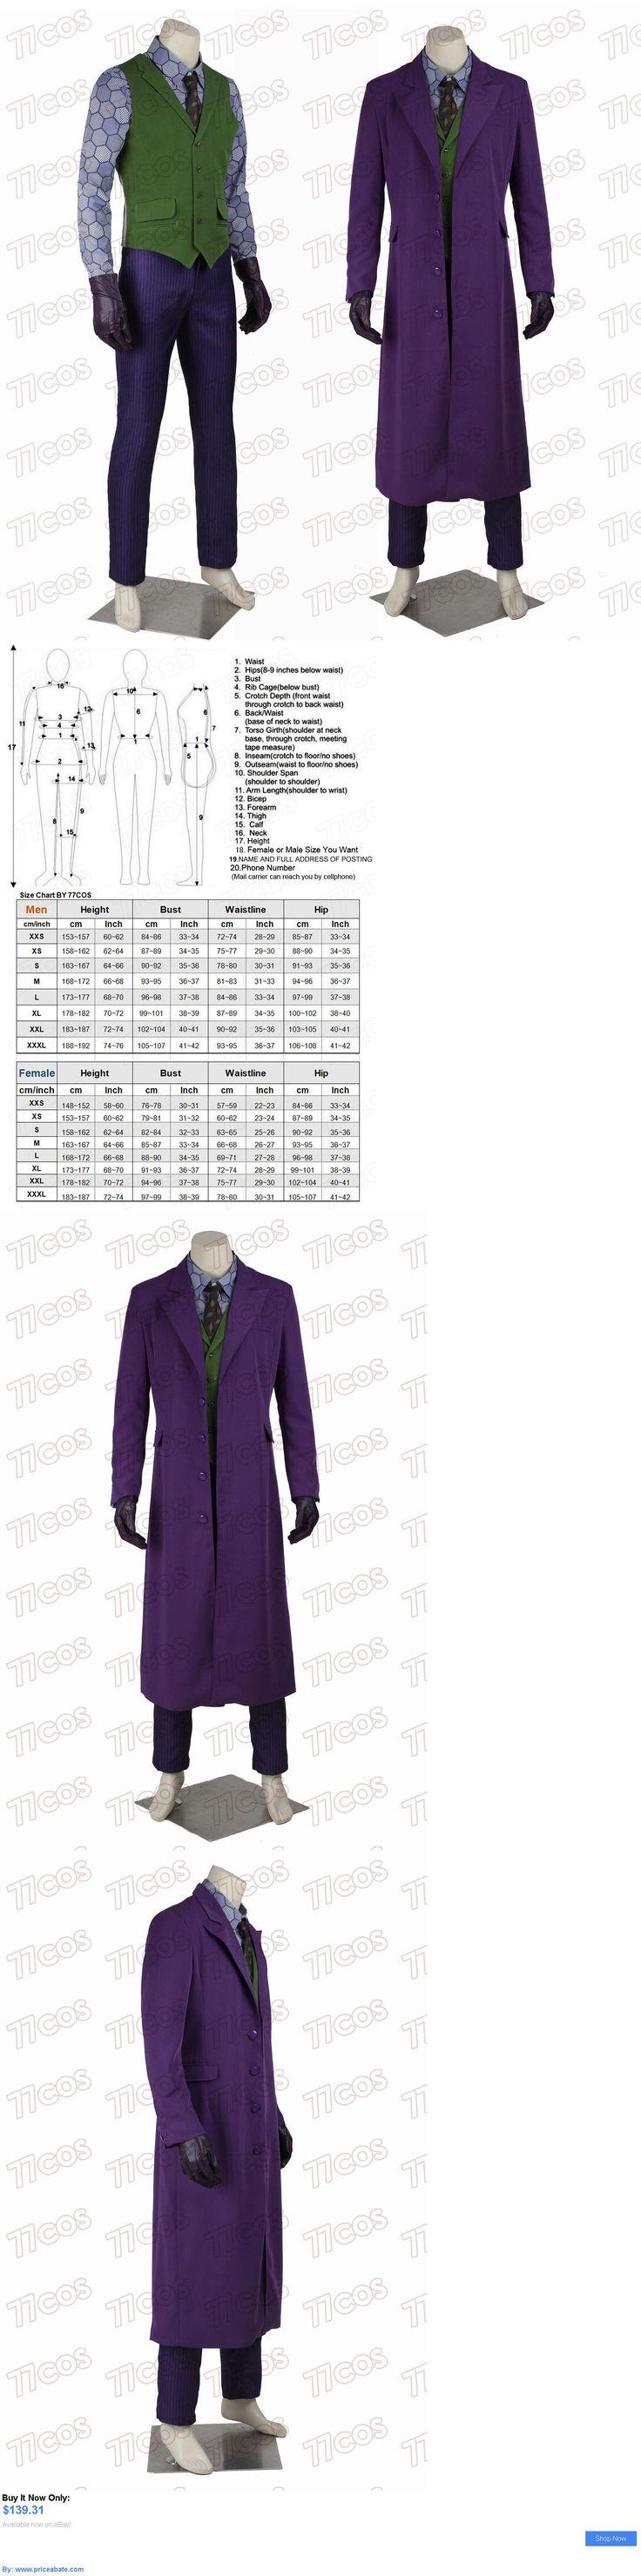 Men Costumes: Batman The Dark Knight Joker Heath Ledger Cosplay Costume Outfit Full Set BUY IT NOW ONLY: $139.31 #priceabateMenCostumes OR #priceabate